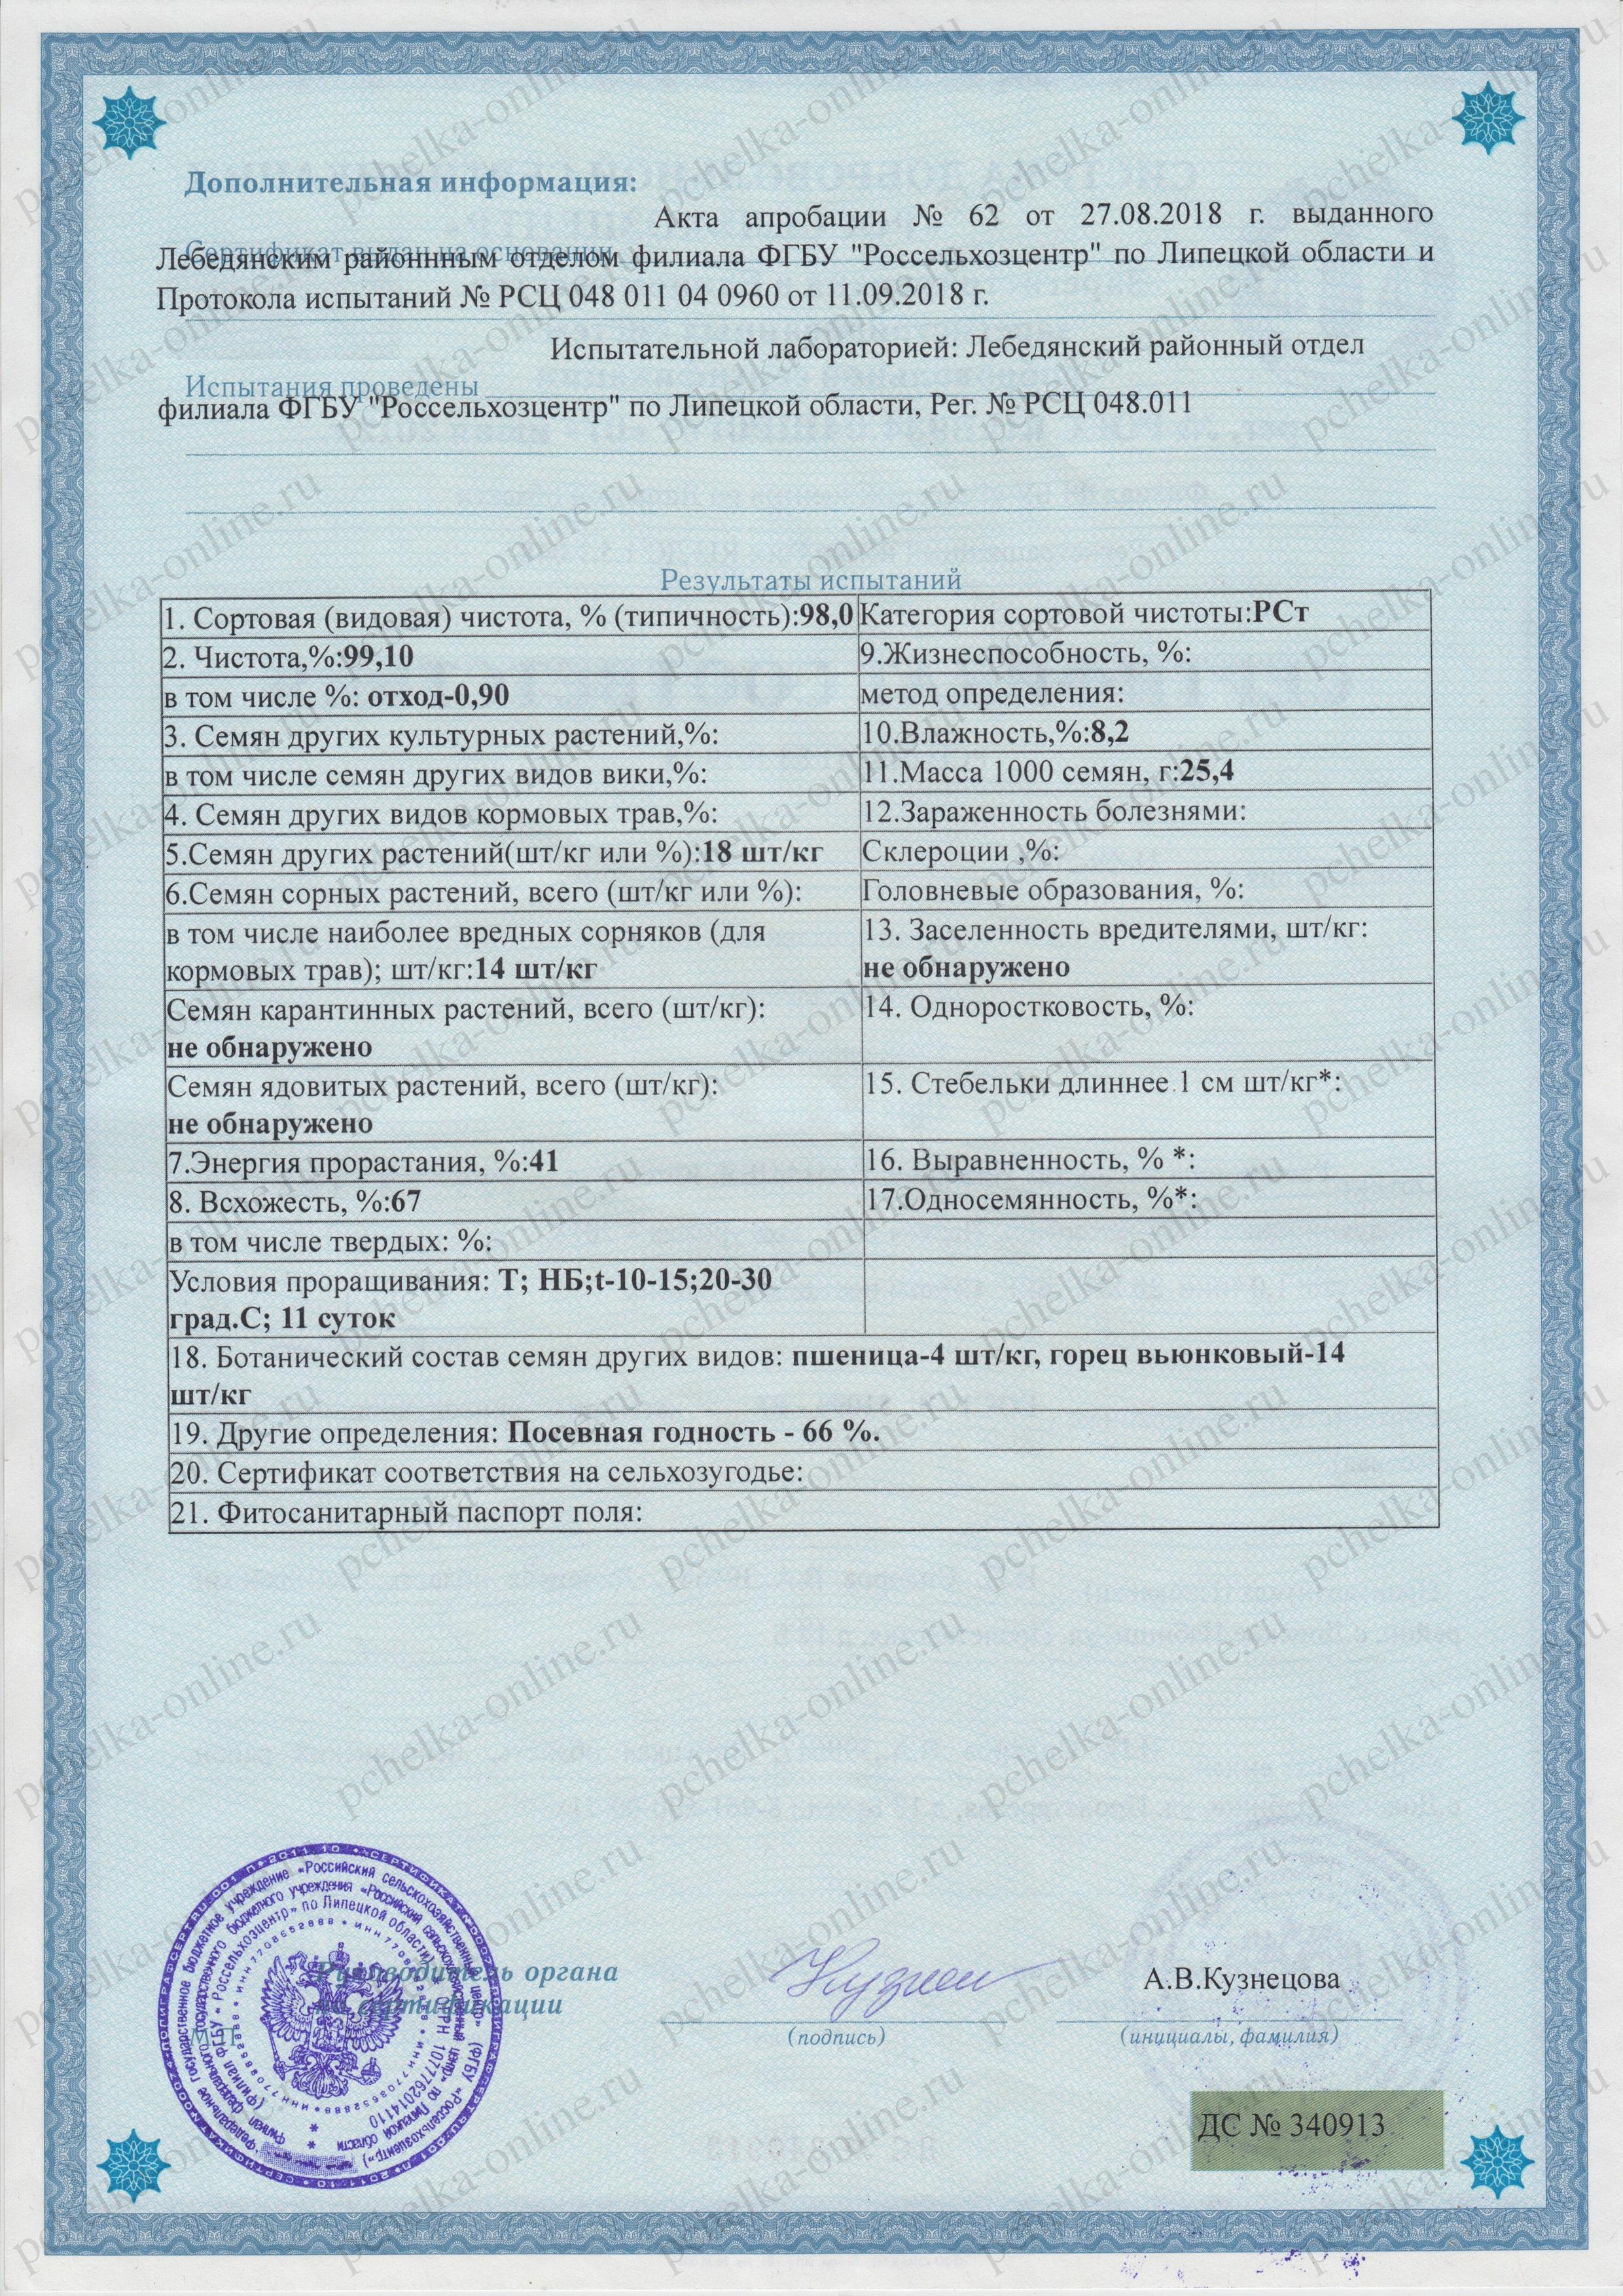 Сертификат_соответствия_расторопша_2016-2017_стр2_watermark2.jpg